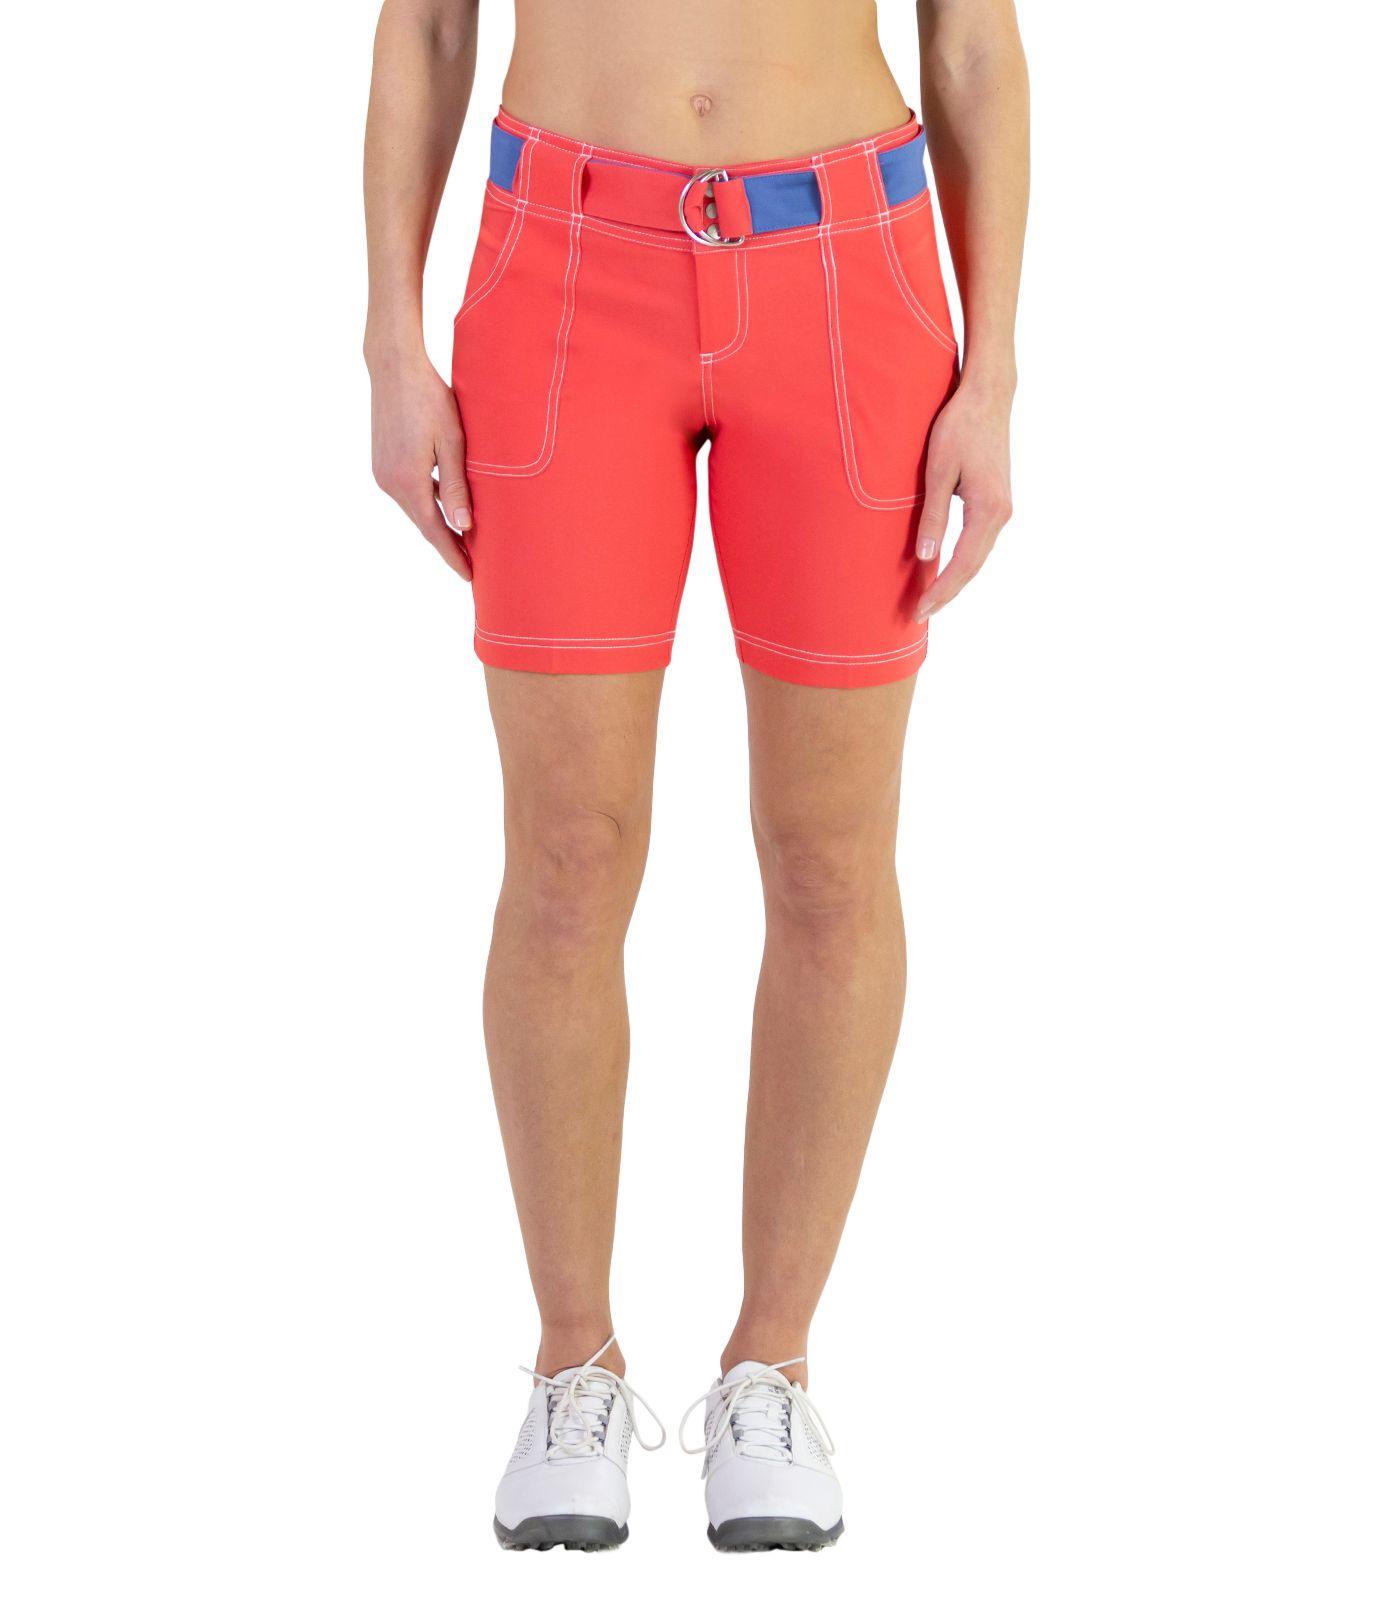 Jofit Women's Belted Golf Shorts